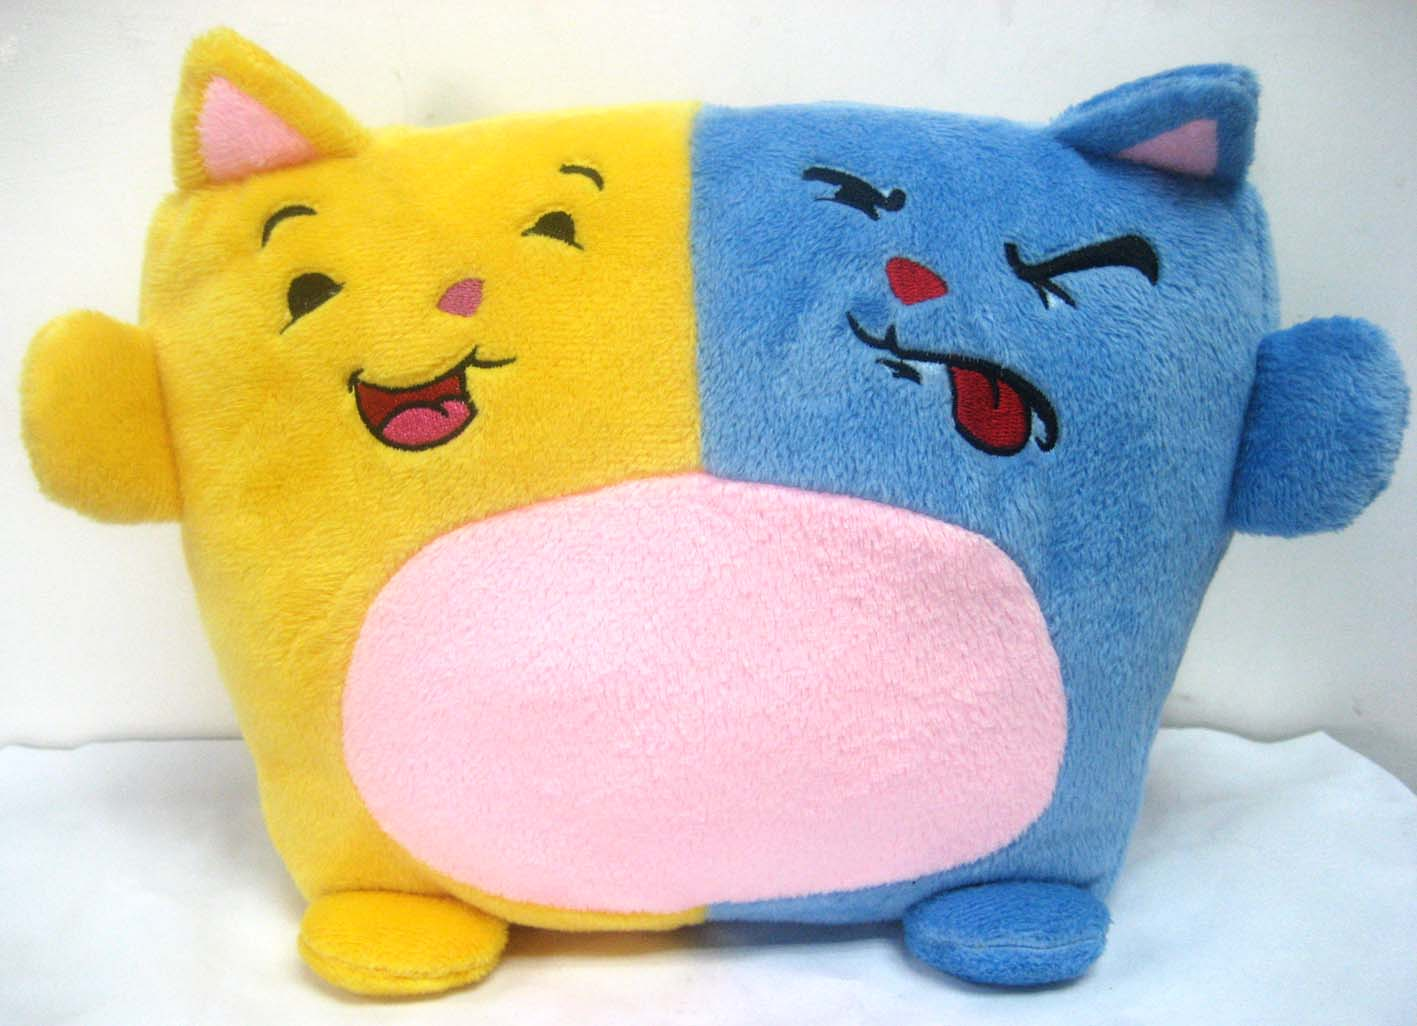 Konjoined Kitty: Plush Toy